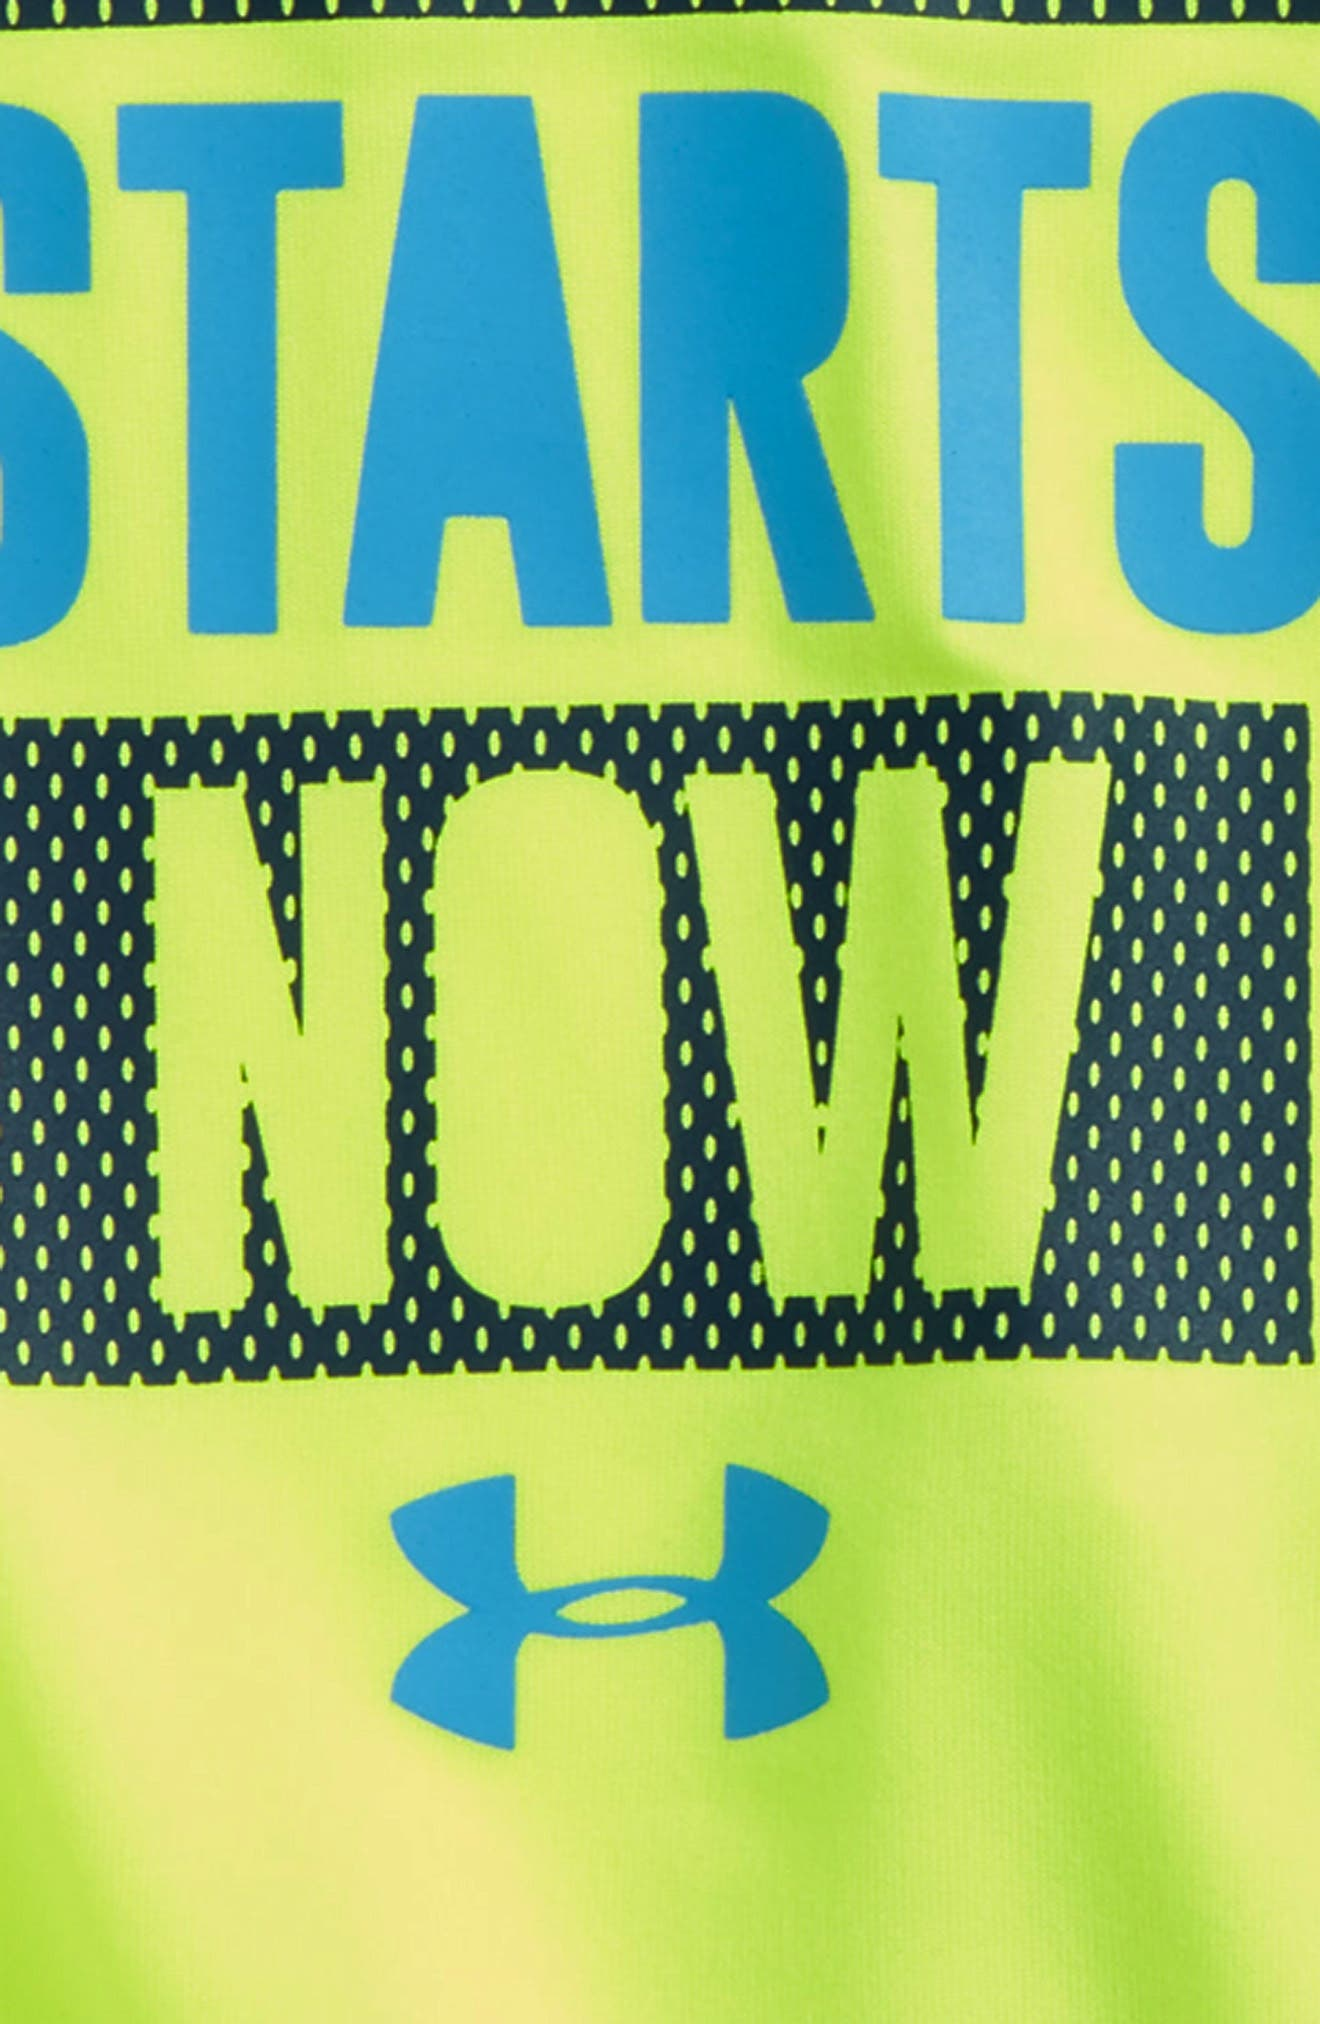 The Training Starts Now T-Shirt & Shorts Set,                             Alternate thumbnail 2, color,                             Green/ Yellow